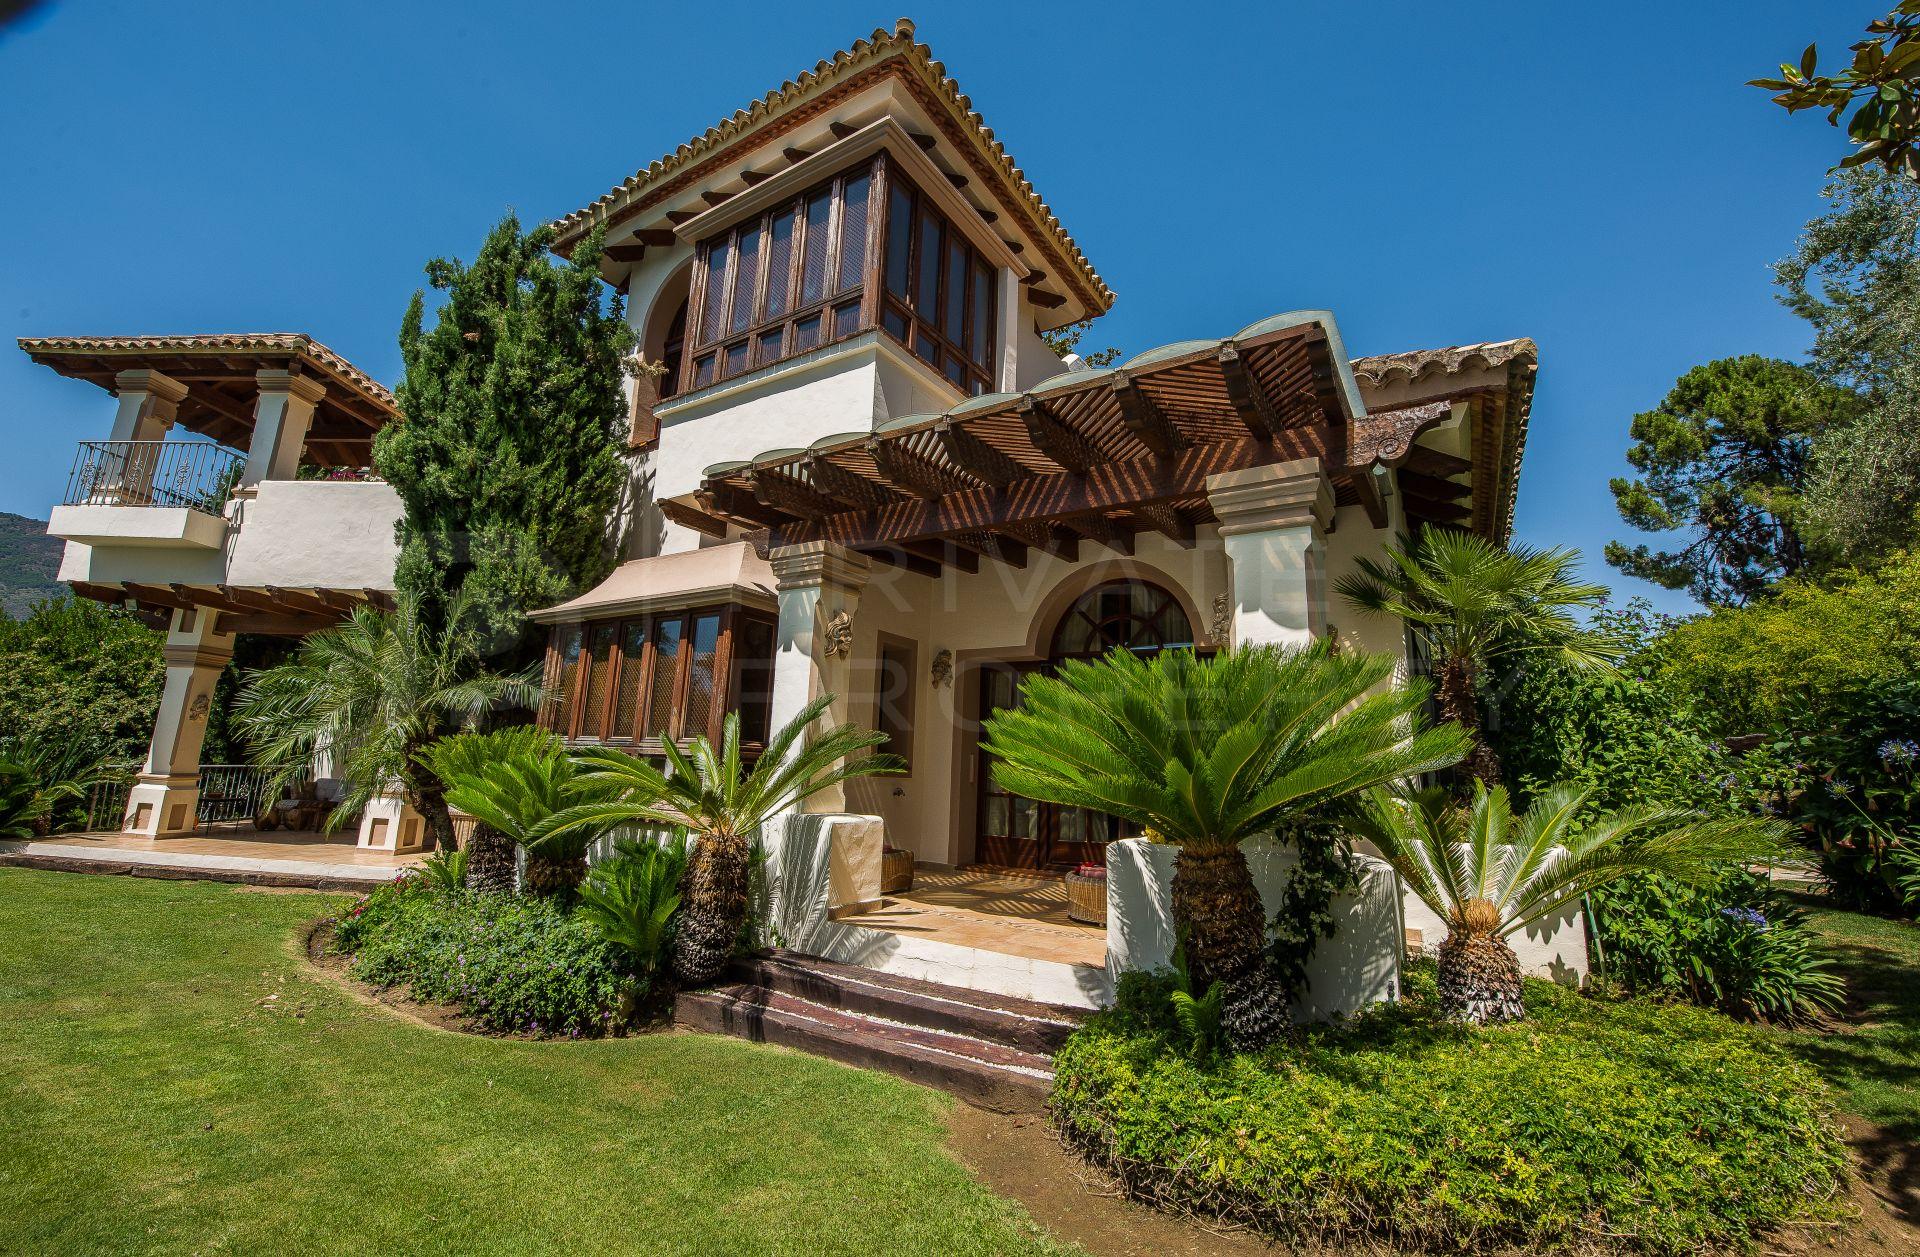 Charming villa in La Zagaleta